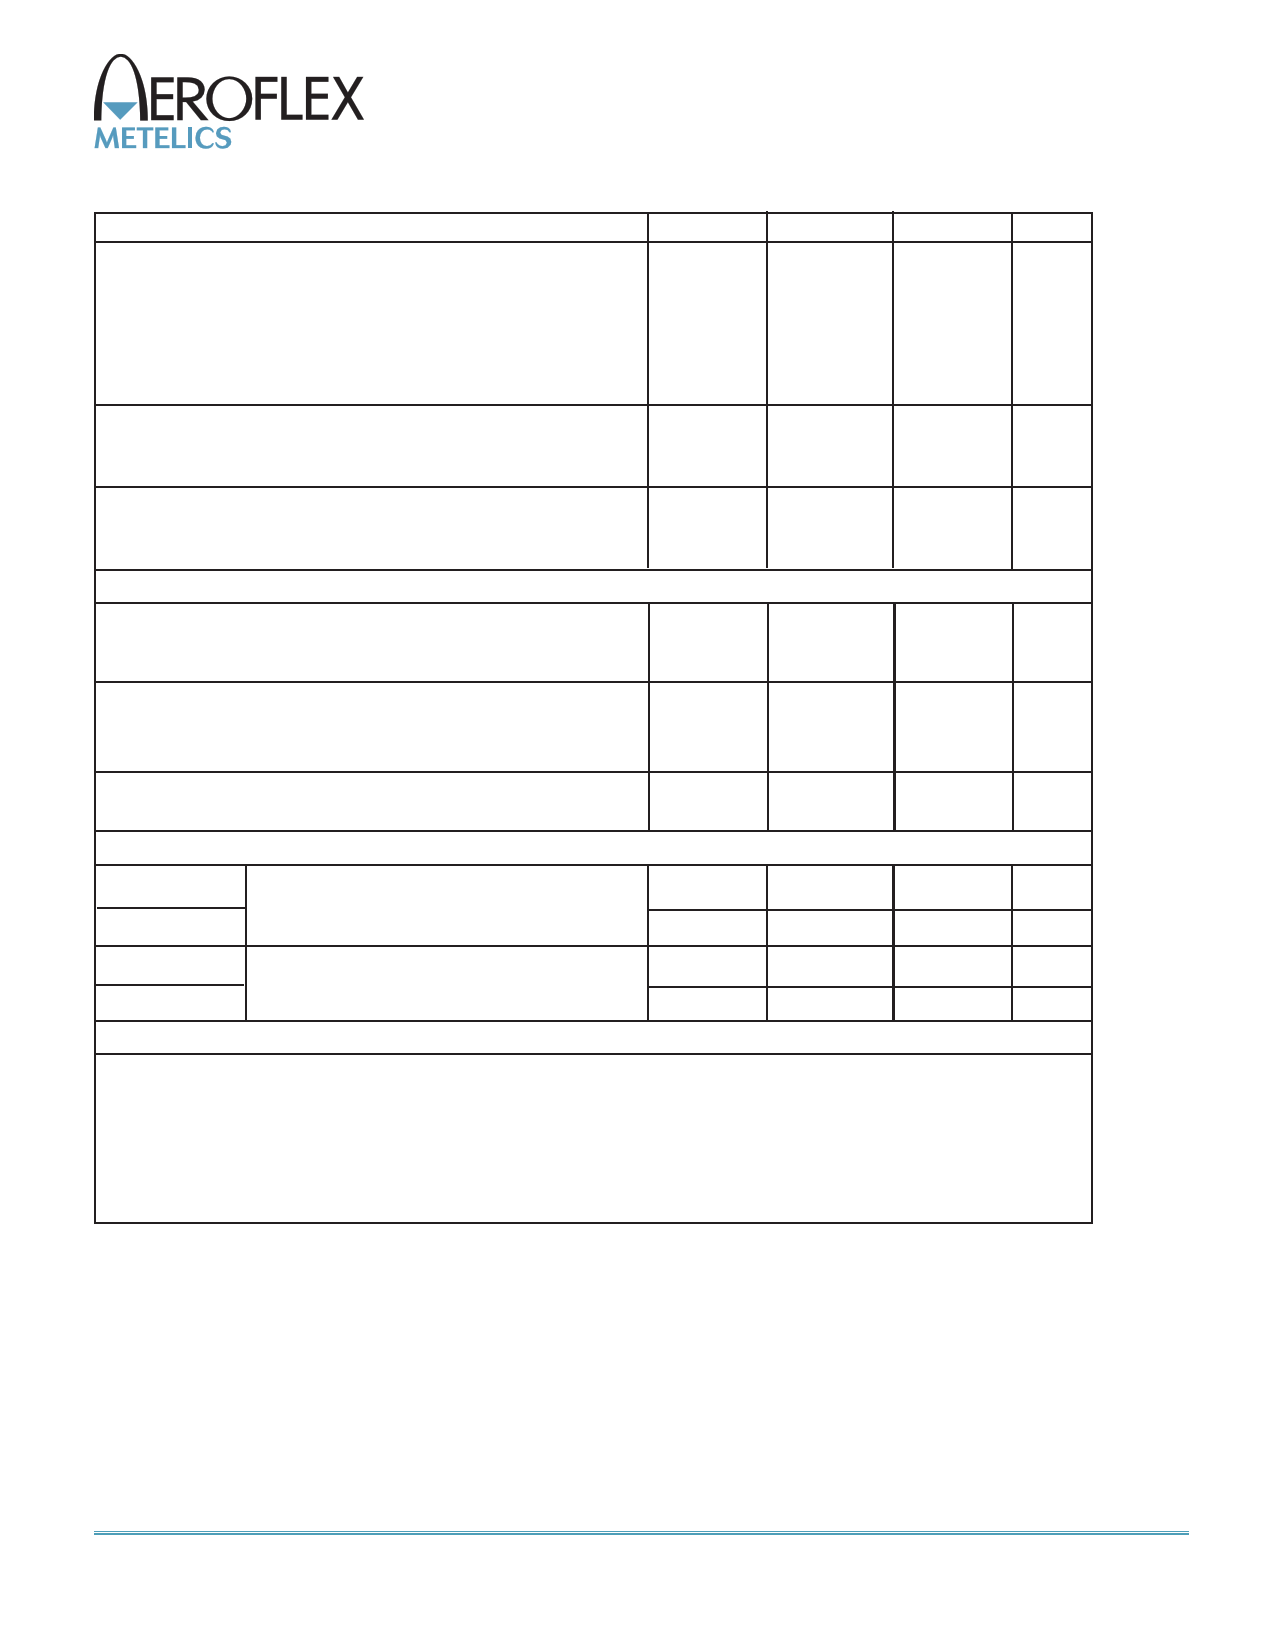 2N5237 pdf, equivalent, schematic